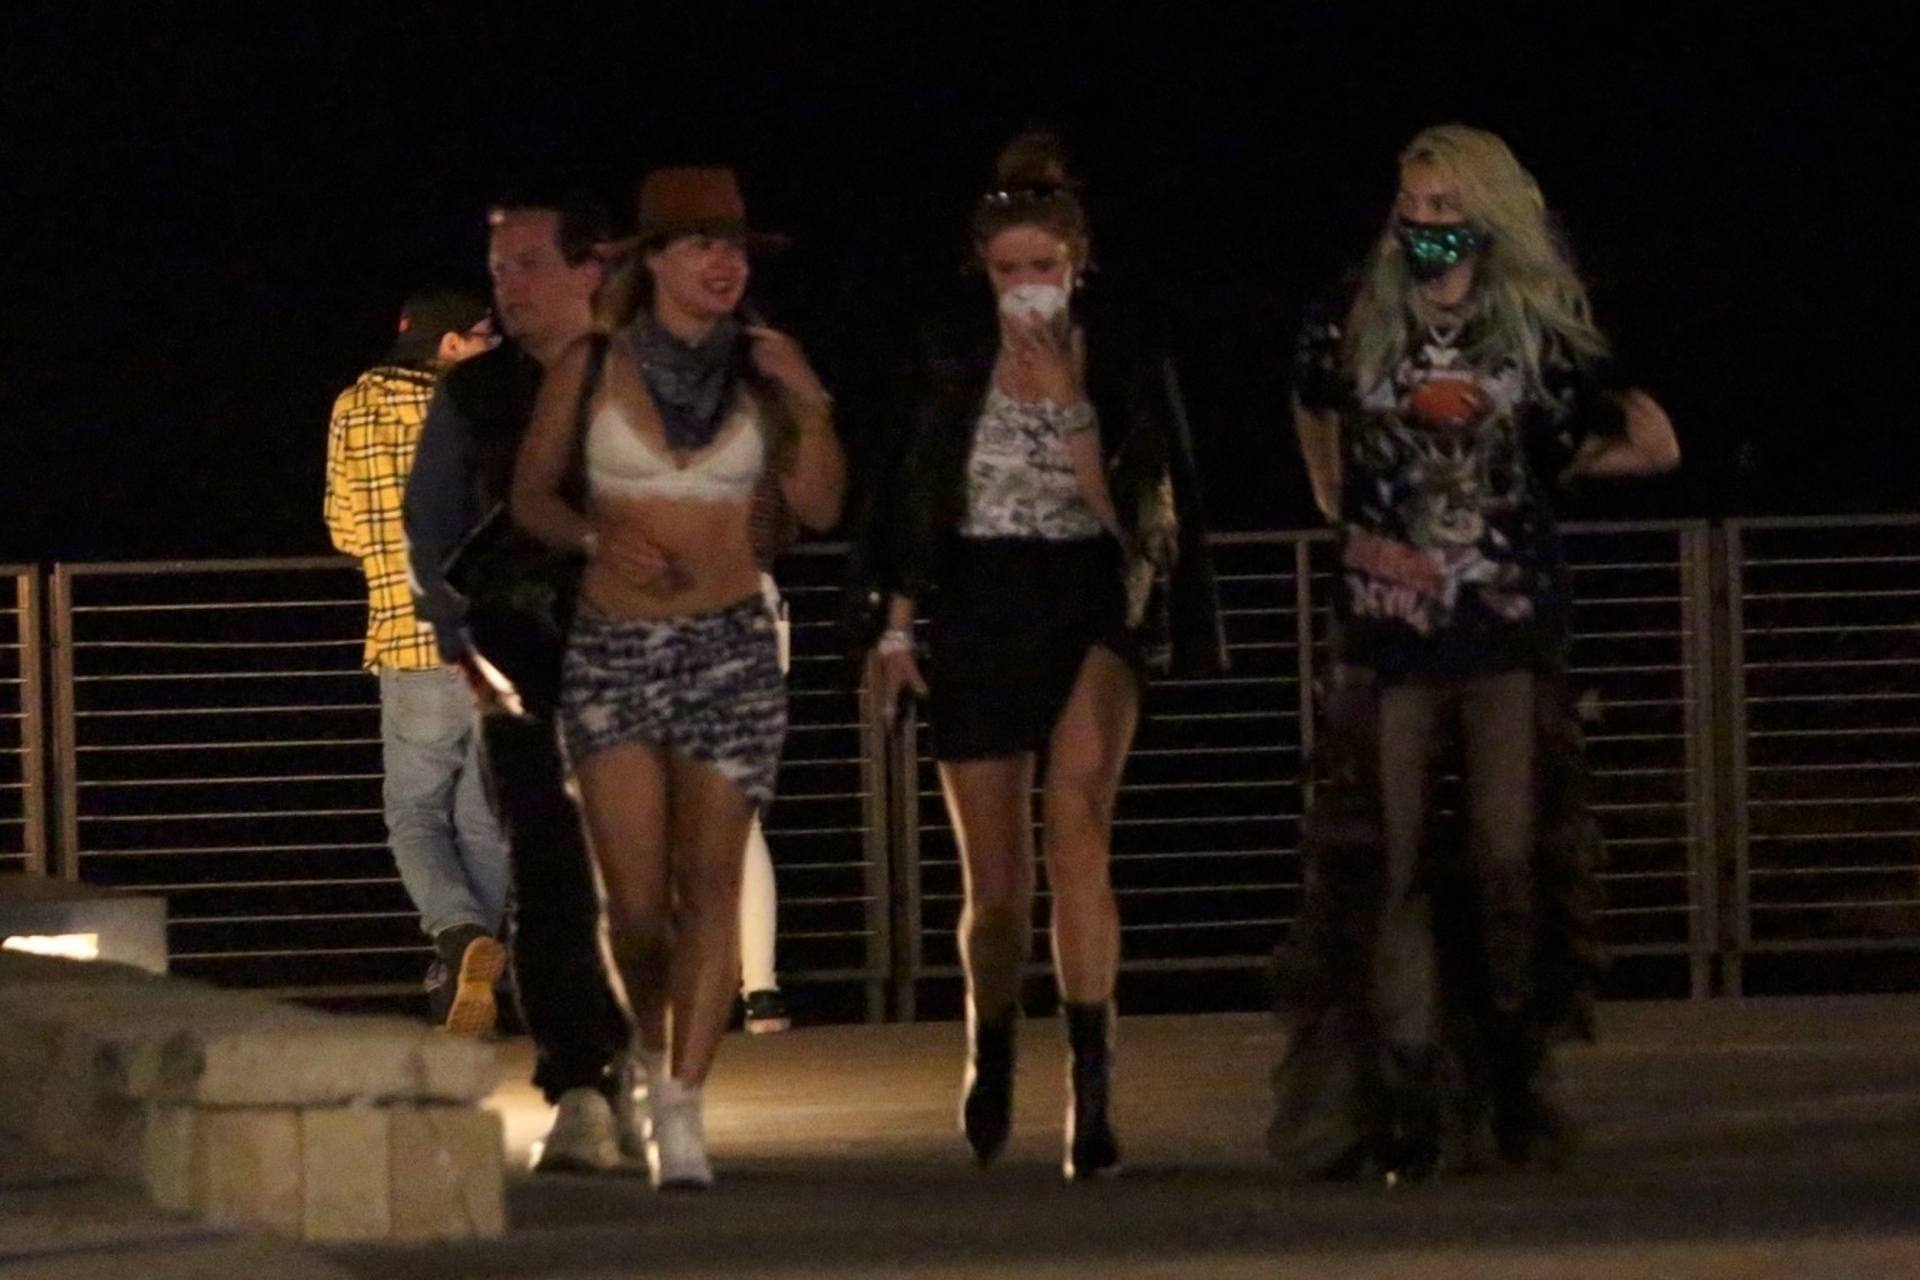 Bella & Dani Thorne – Sexy Legs In Mini Skirts At Nobu In Malibu 0009